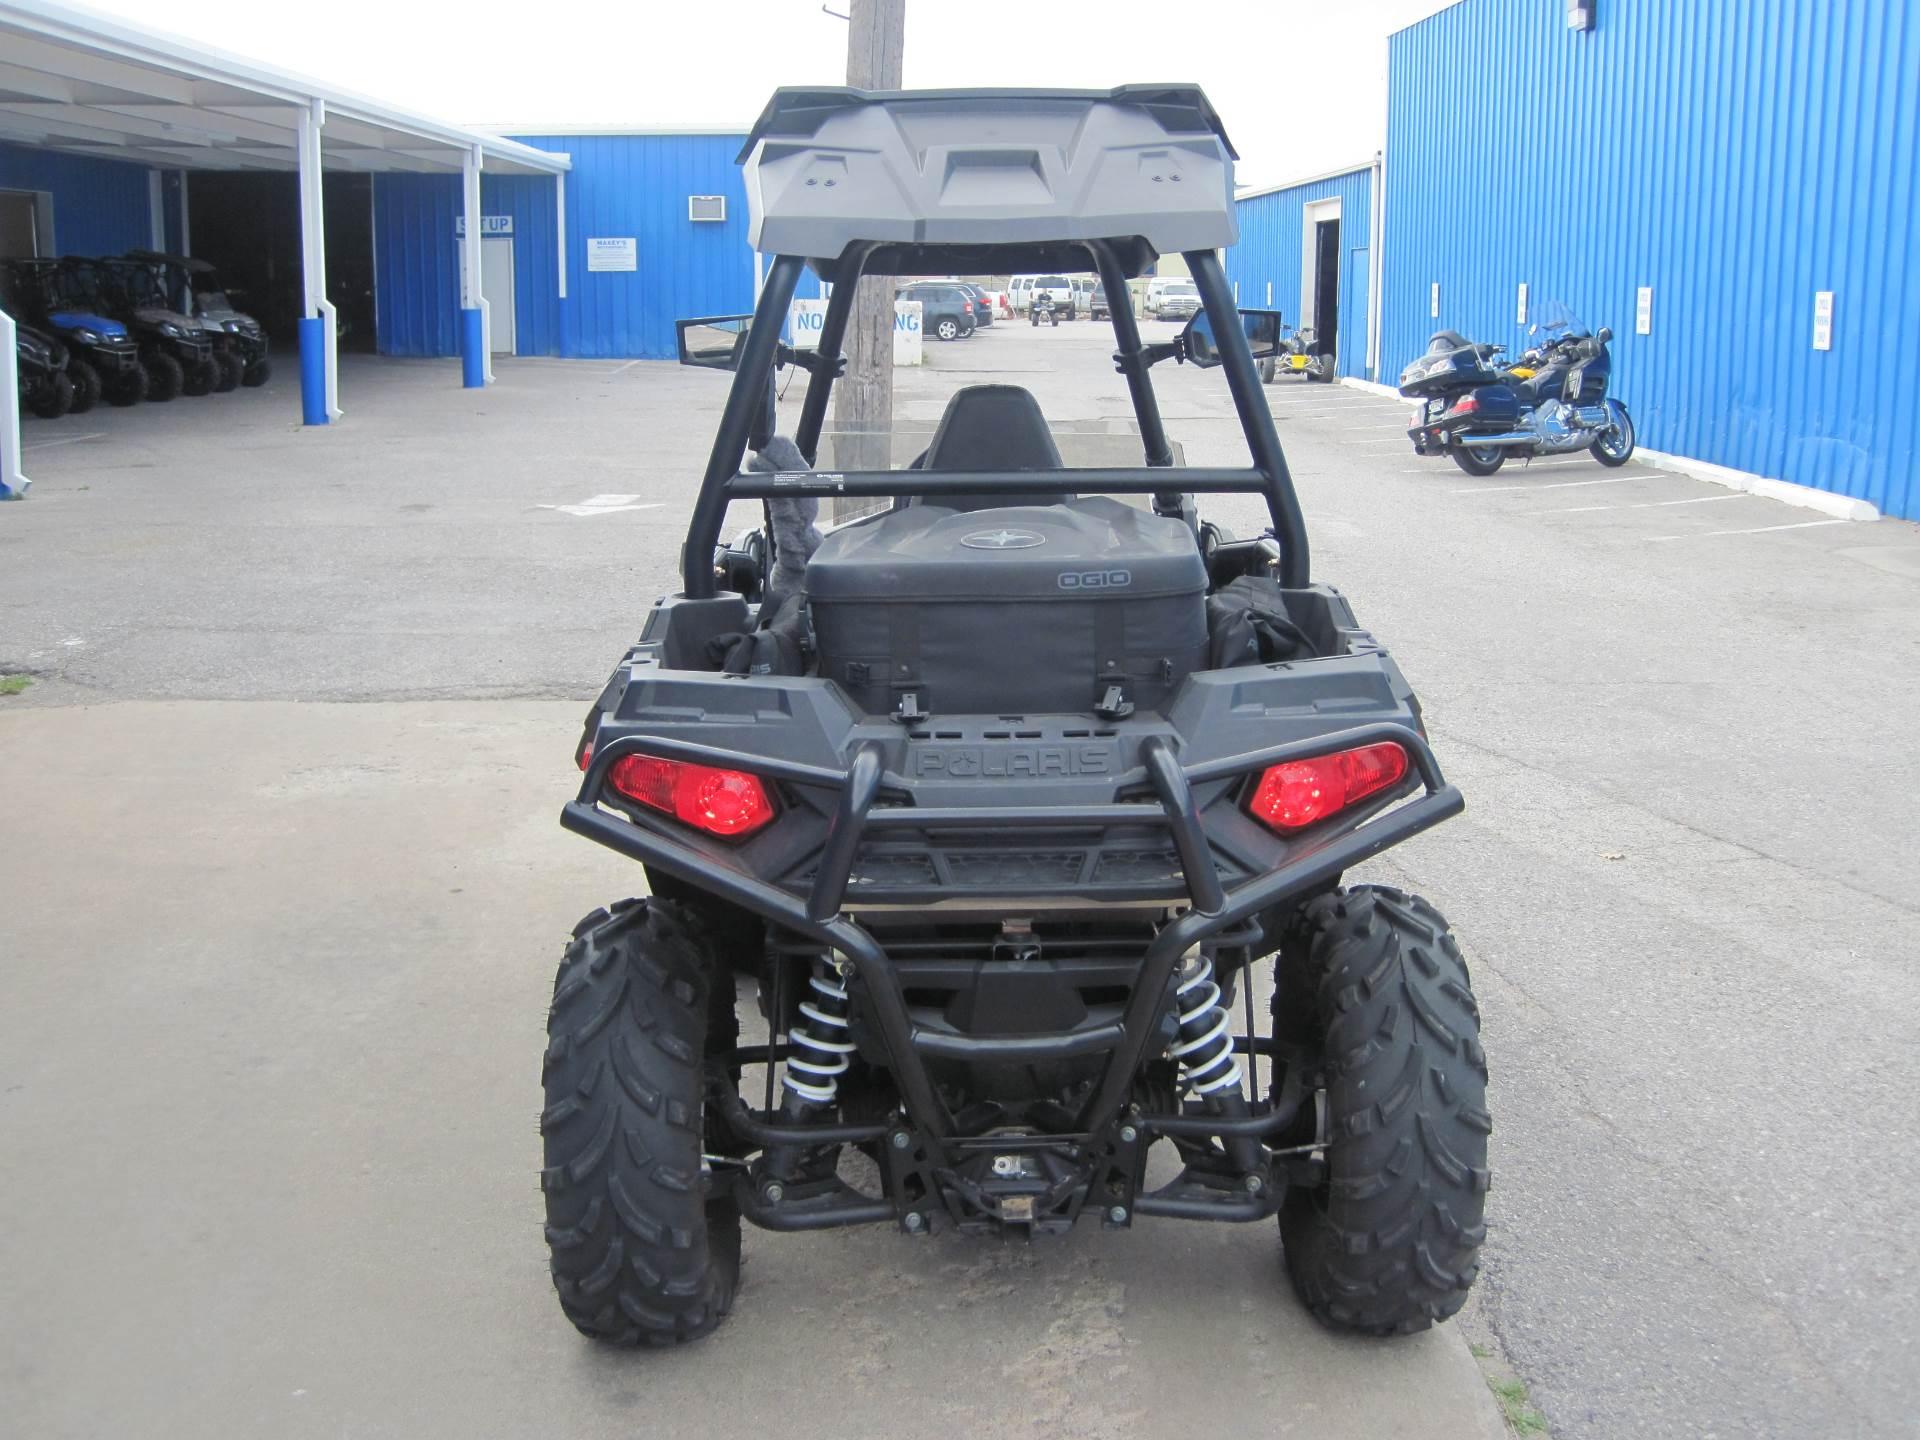 2016 Polaris ACE 900 SP in Oklahoma City, Oklahoma